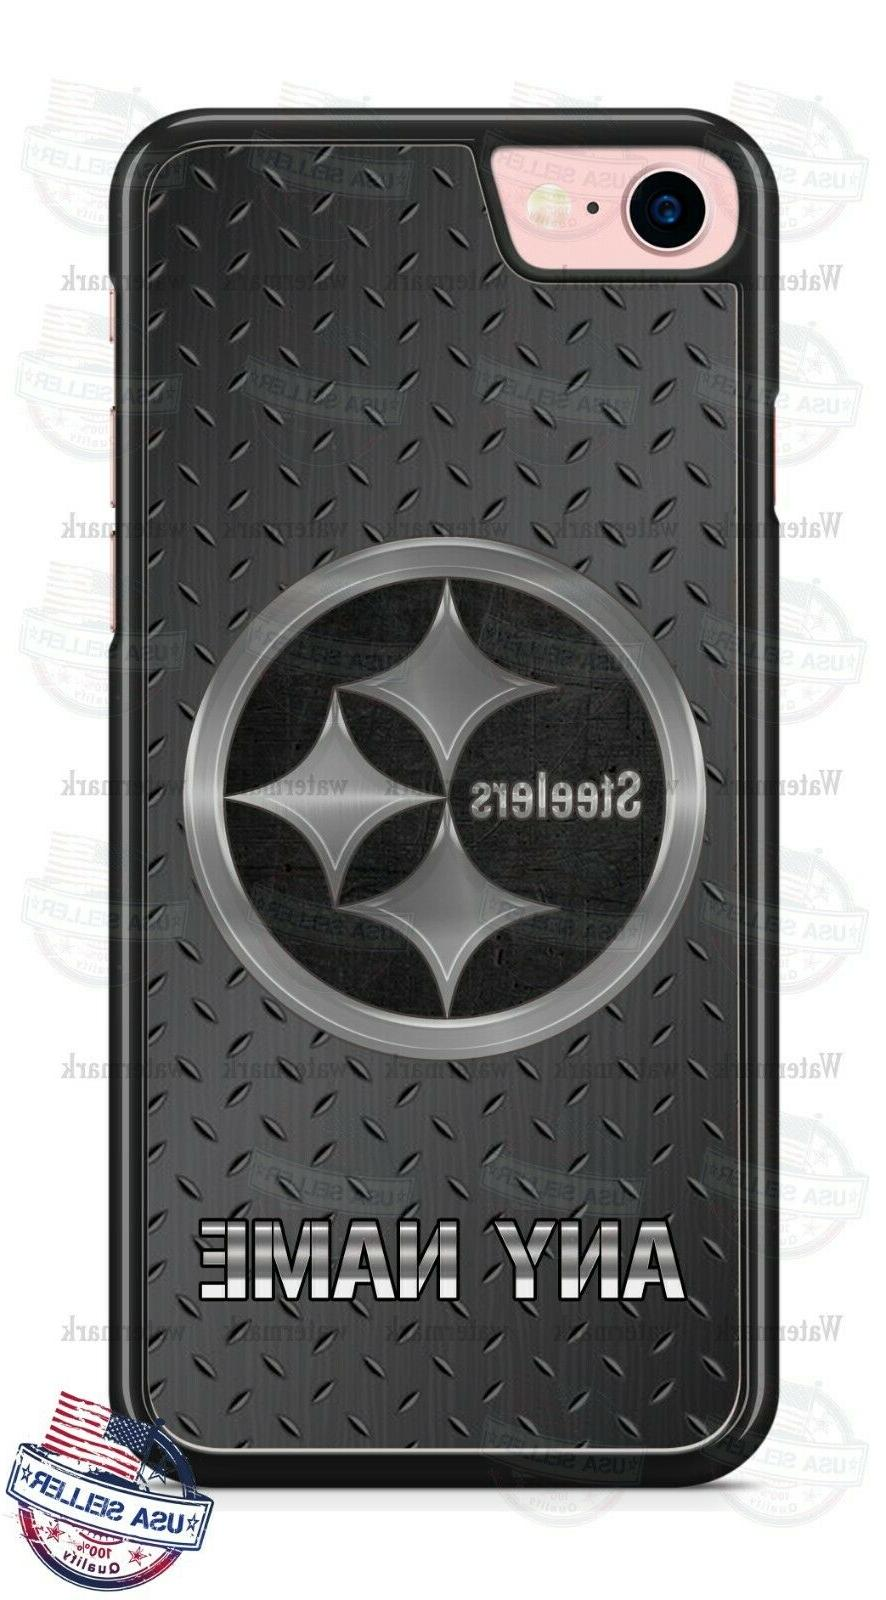 pittsburgh steelers logo any name phone case